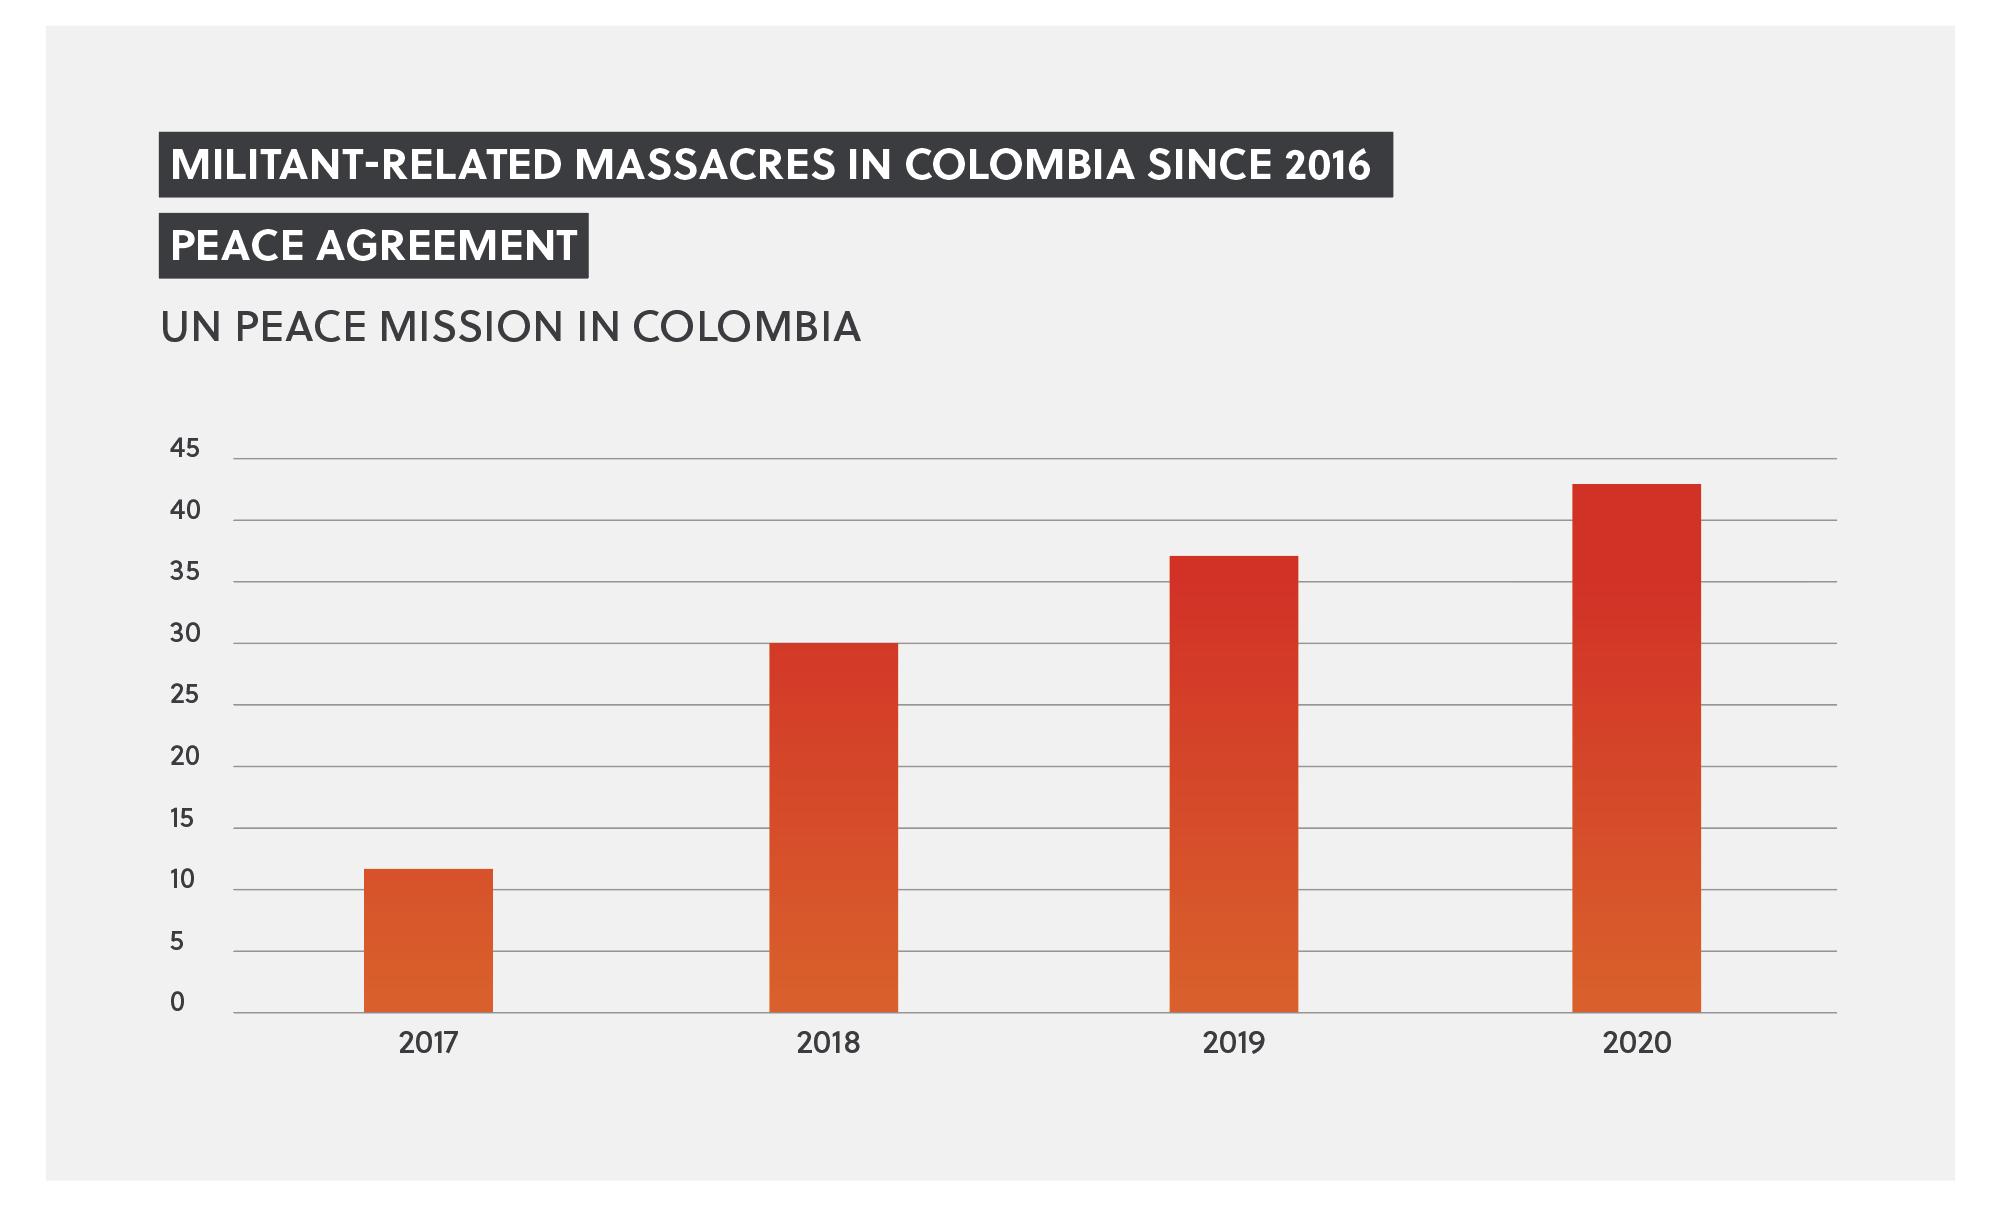 Massacres in Colombia